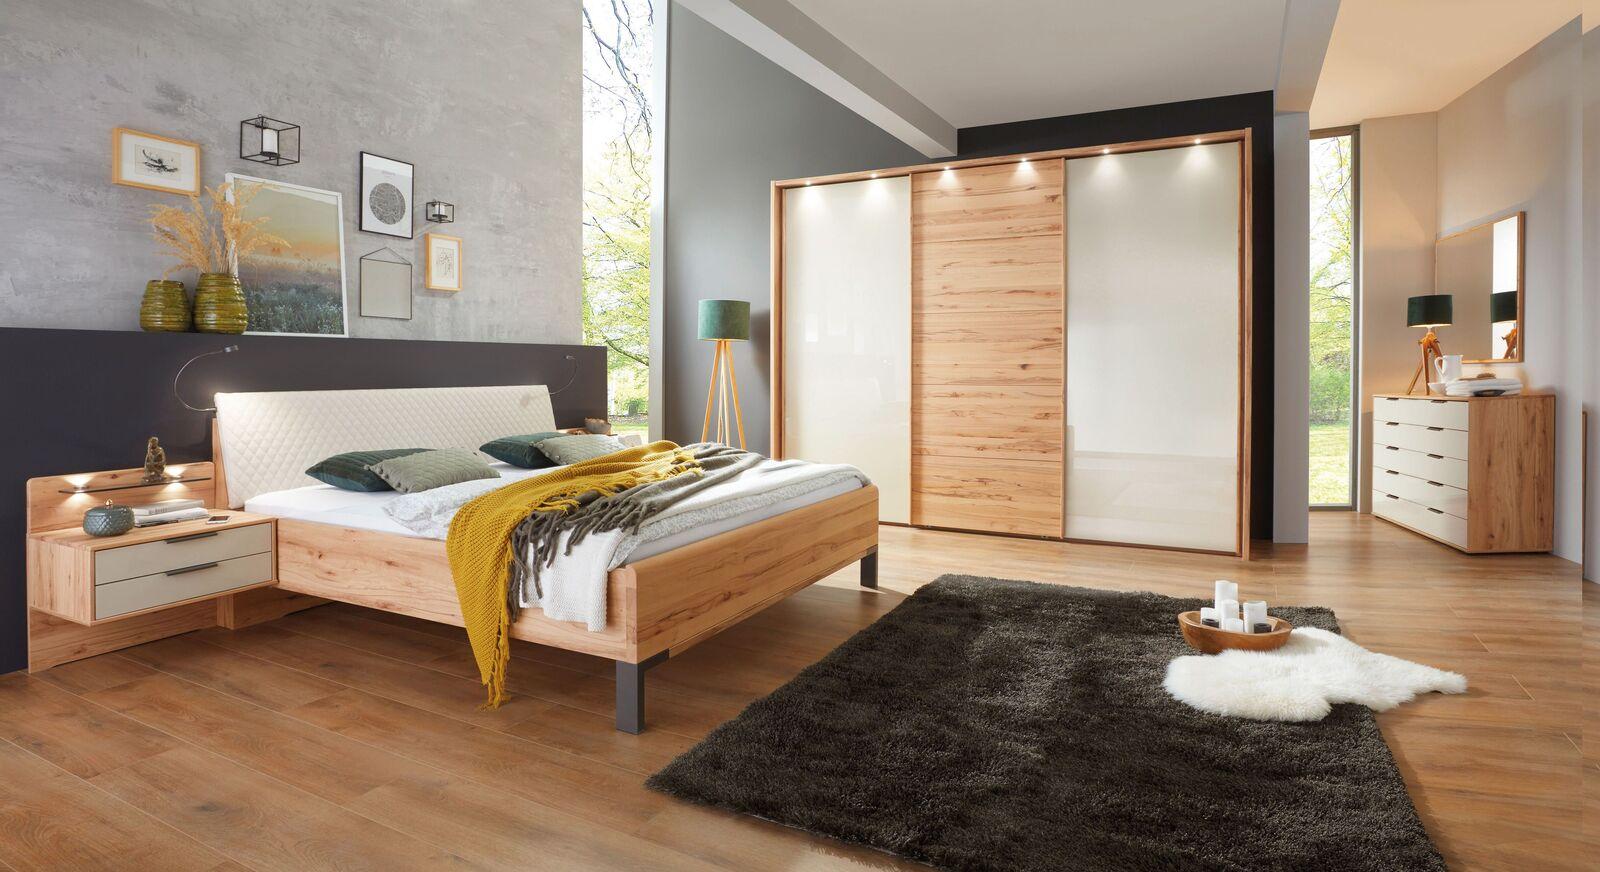 Komplett-Schlafzimmer Leandra in stilvollem Materialmix